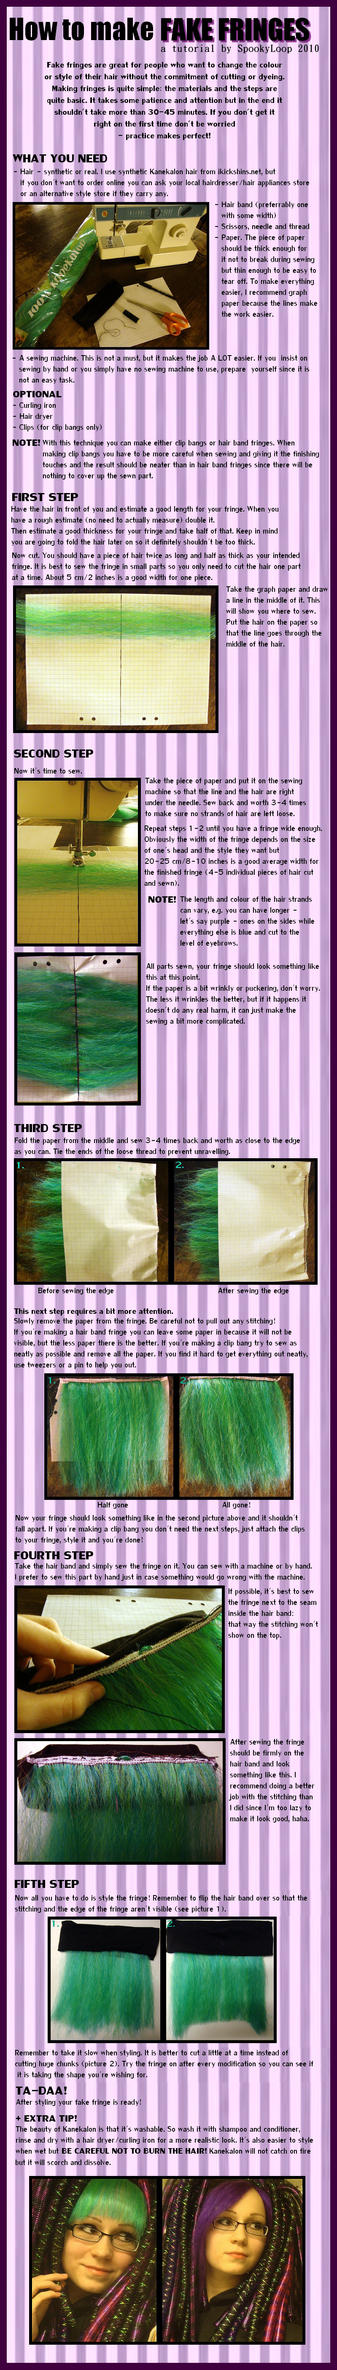 How to Make Fake Fringes by SpookyLoop